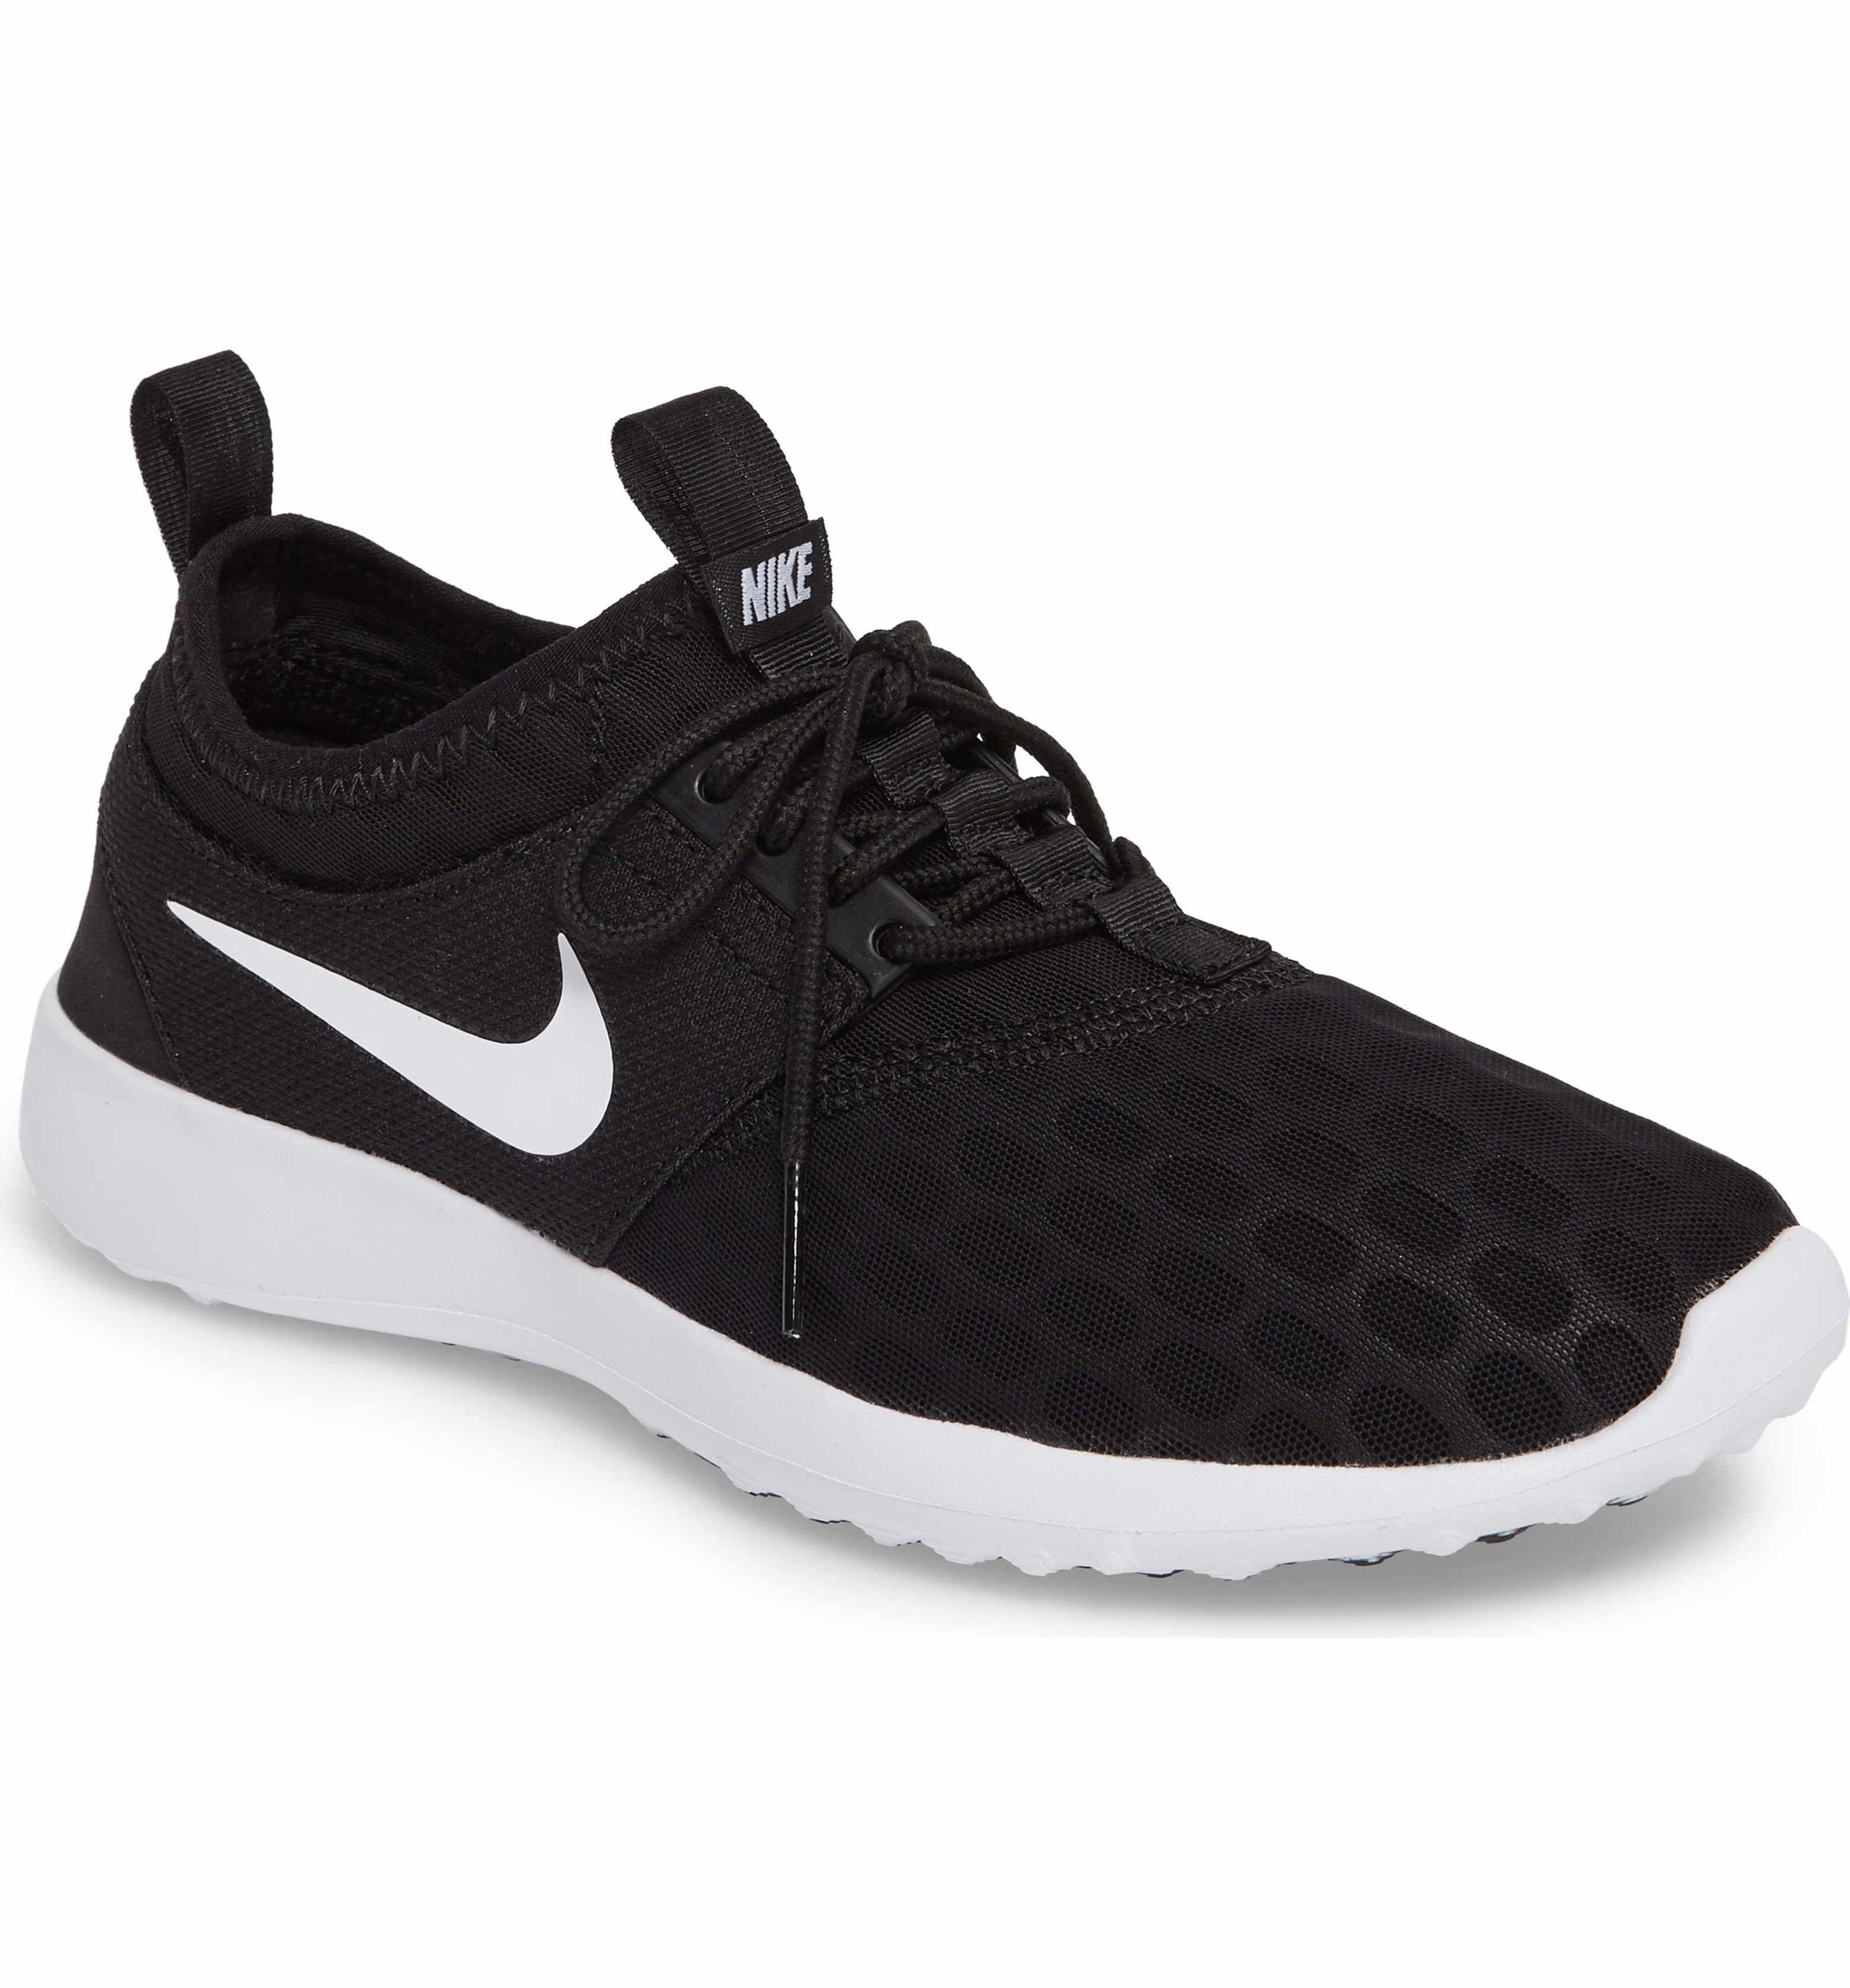 Nike Juvenate Sneaker (Women